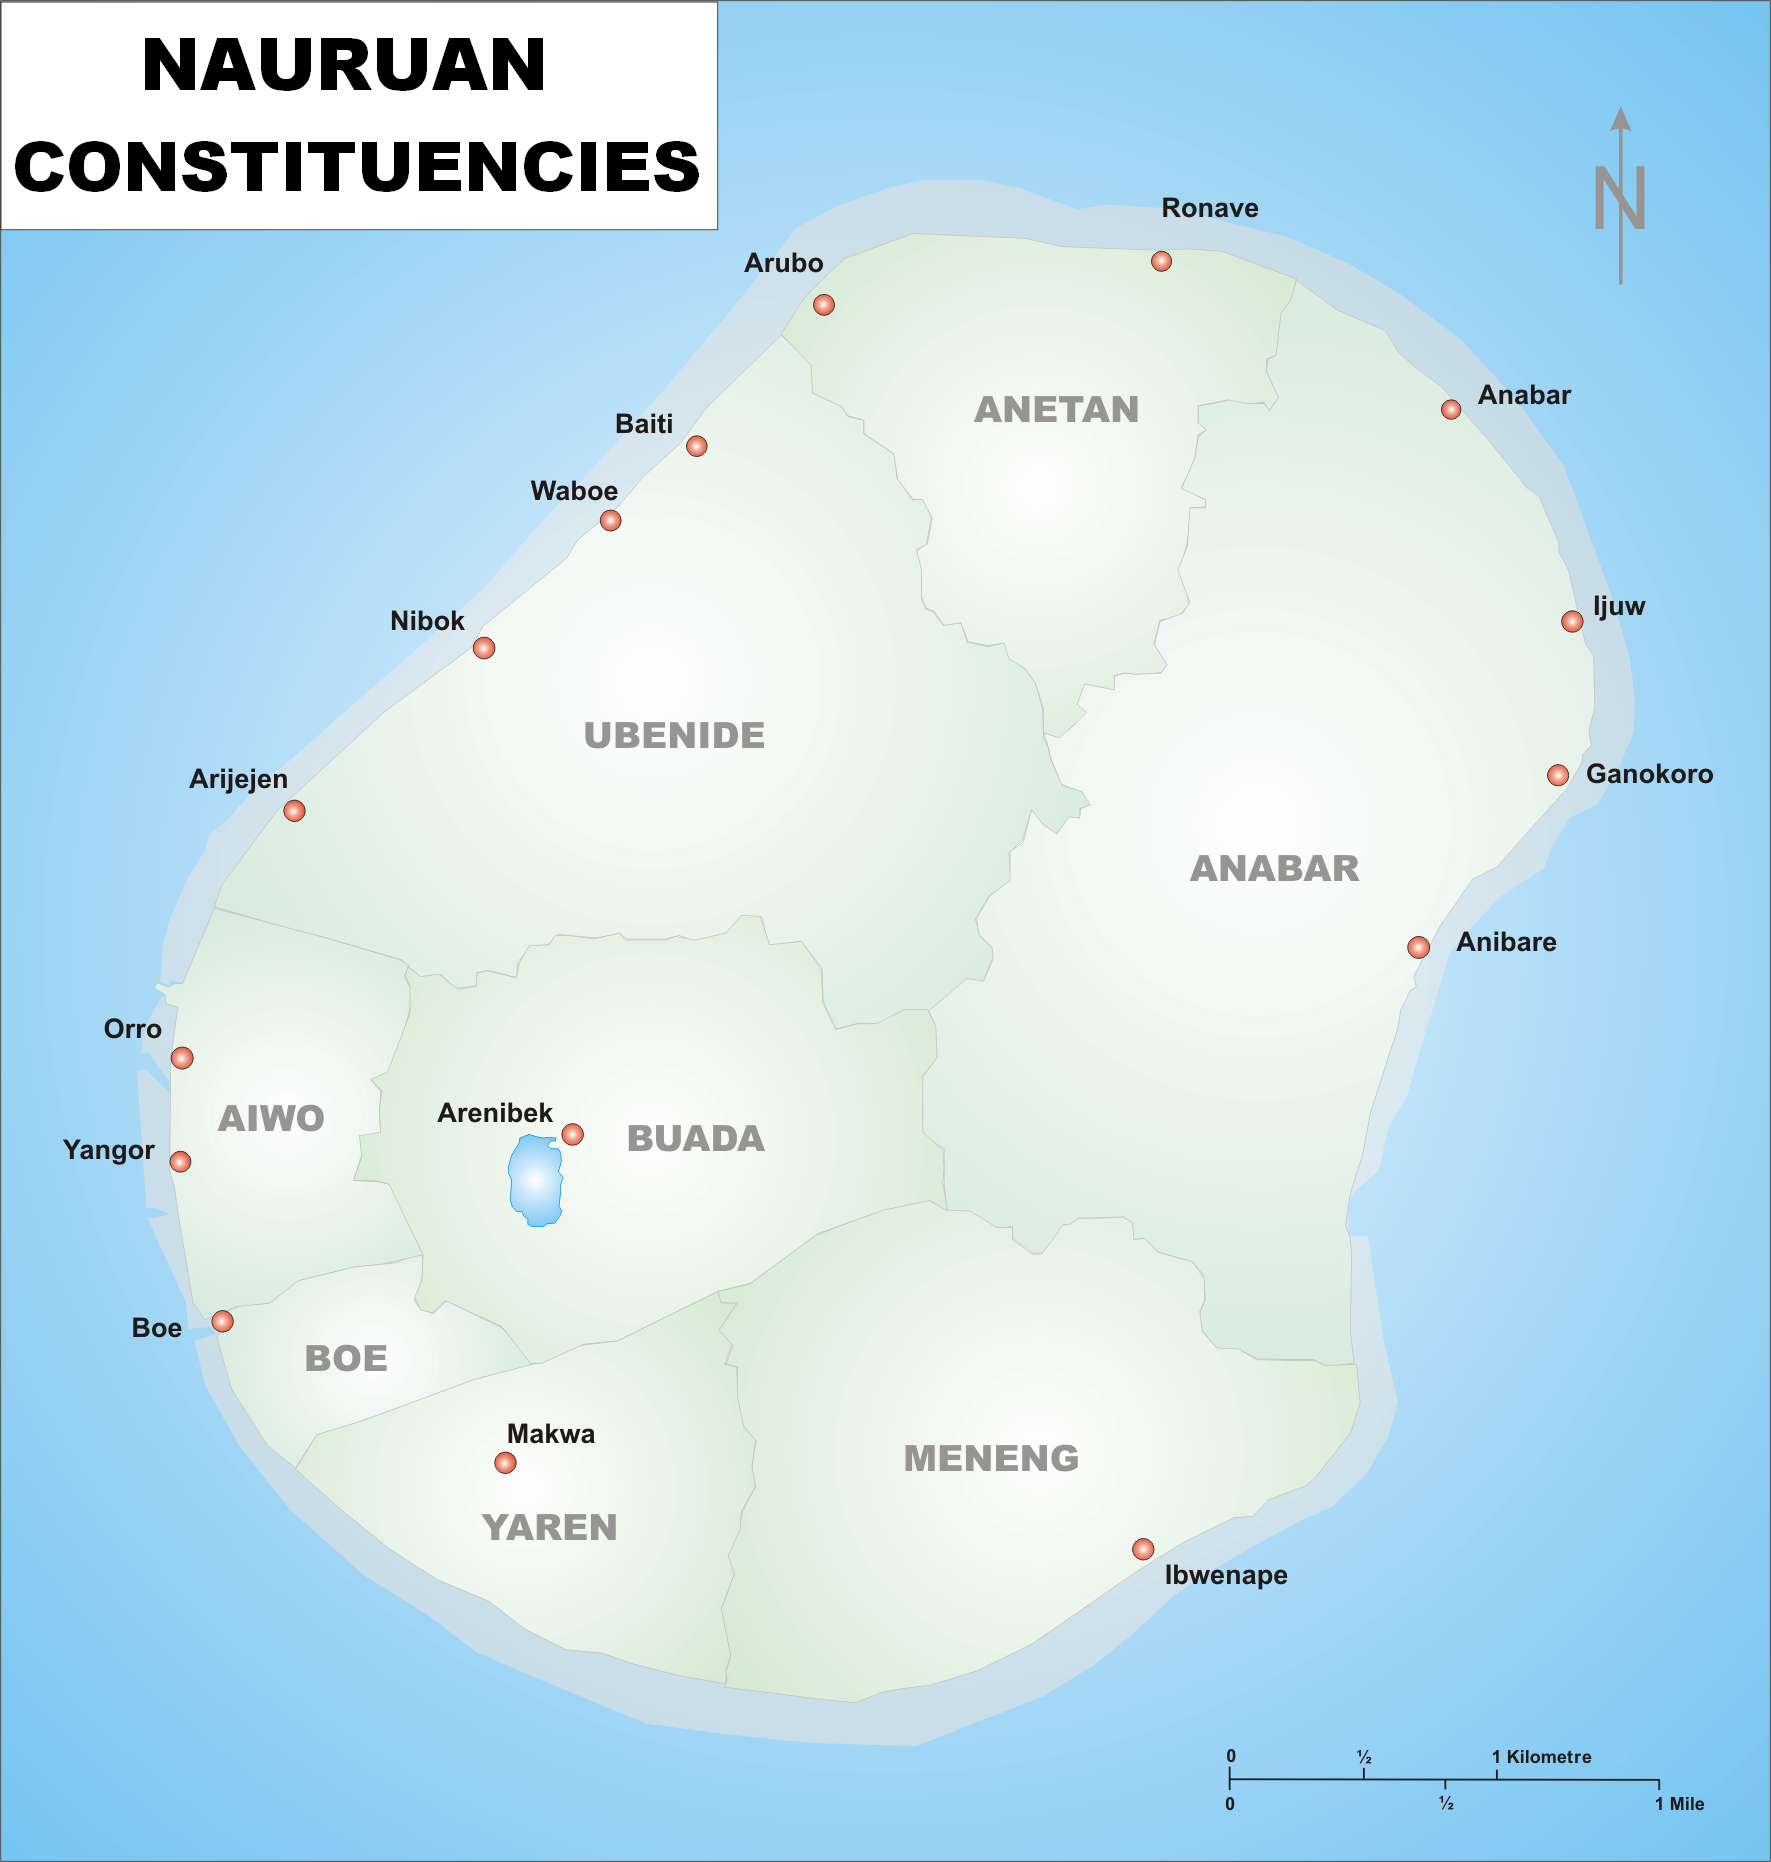 Consuencies of Nauru - Wikipedia on tuvalu map, east timor map, saint kitts and nevis map, libya map, mauritius map, kiribati map, monaco map, liechtenstein map, morocco map, wake island map, new caledonia map, rwanda map, liberia map, algeria map, mauritania map, mozambique map, papua nueva guinea map, kenya map, congo map, senegal map, zimbabwe map, malawi map, new zealand map, sudan map, madagascar map, the marshall islands map, niue map, ghana map, mali map, namibia map, burundi map, saint pierre and miquelon map, tunisia map, angola map, niger map, timor-leste map, solomon islands map, cook islands map, netherlands map, oceania map,